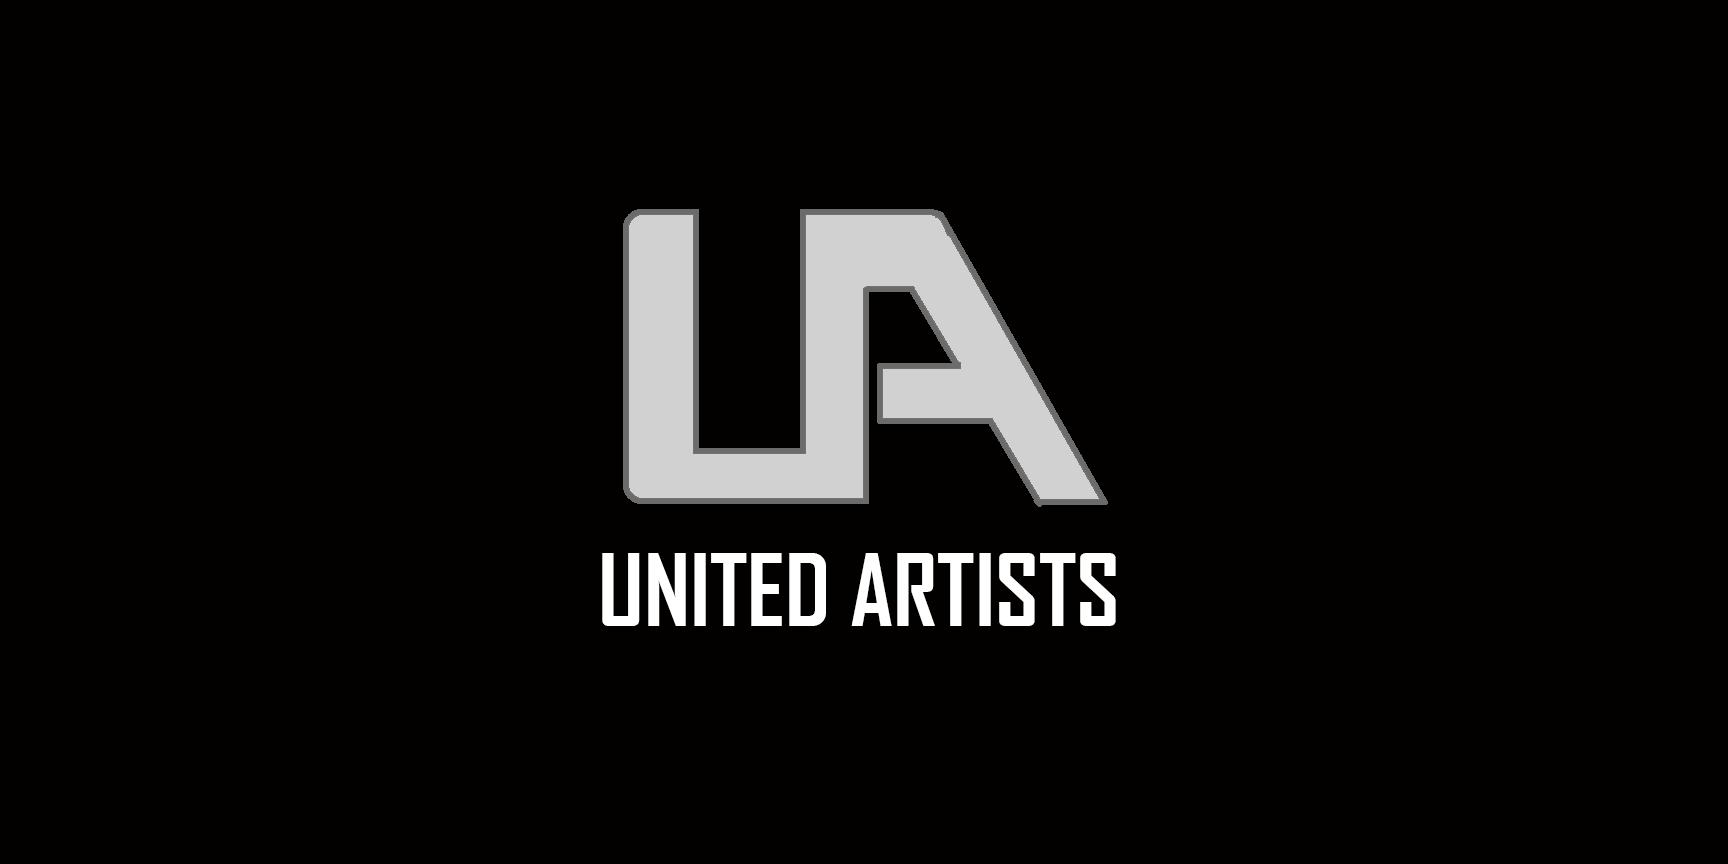 alternate_universe_united_artists_logo_c